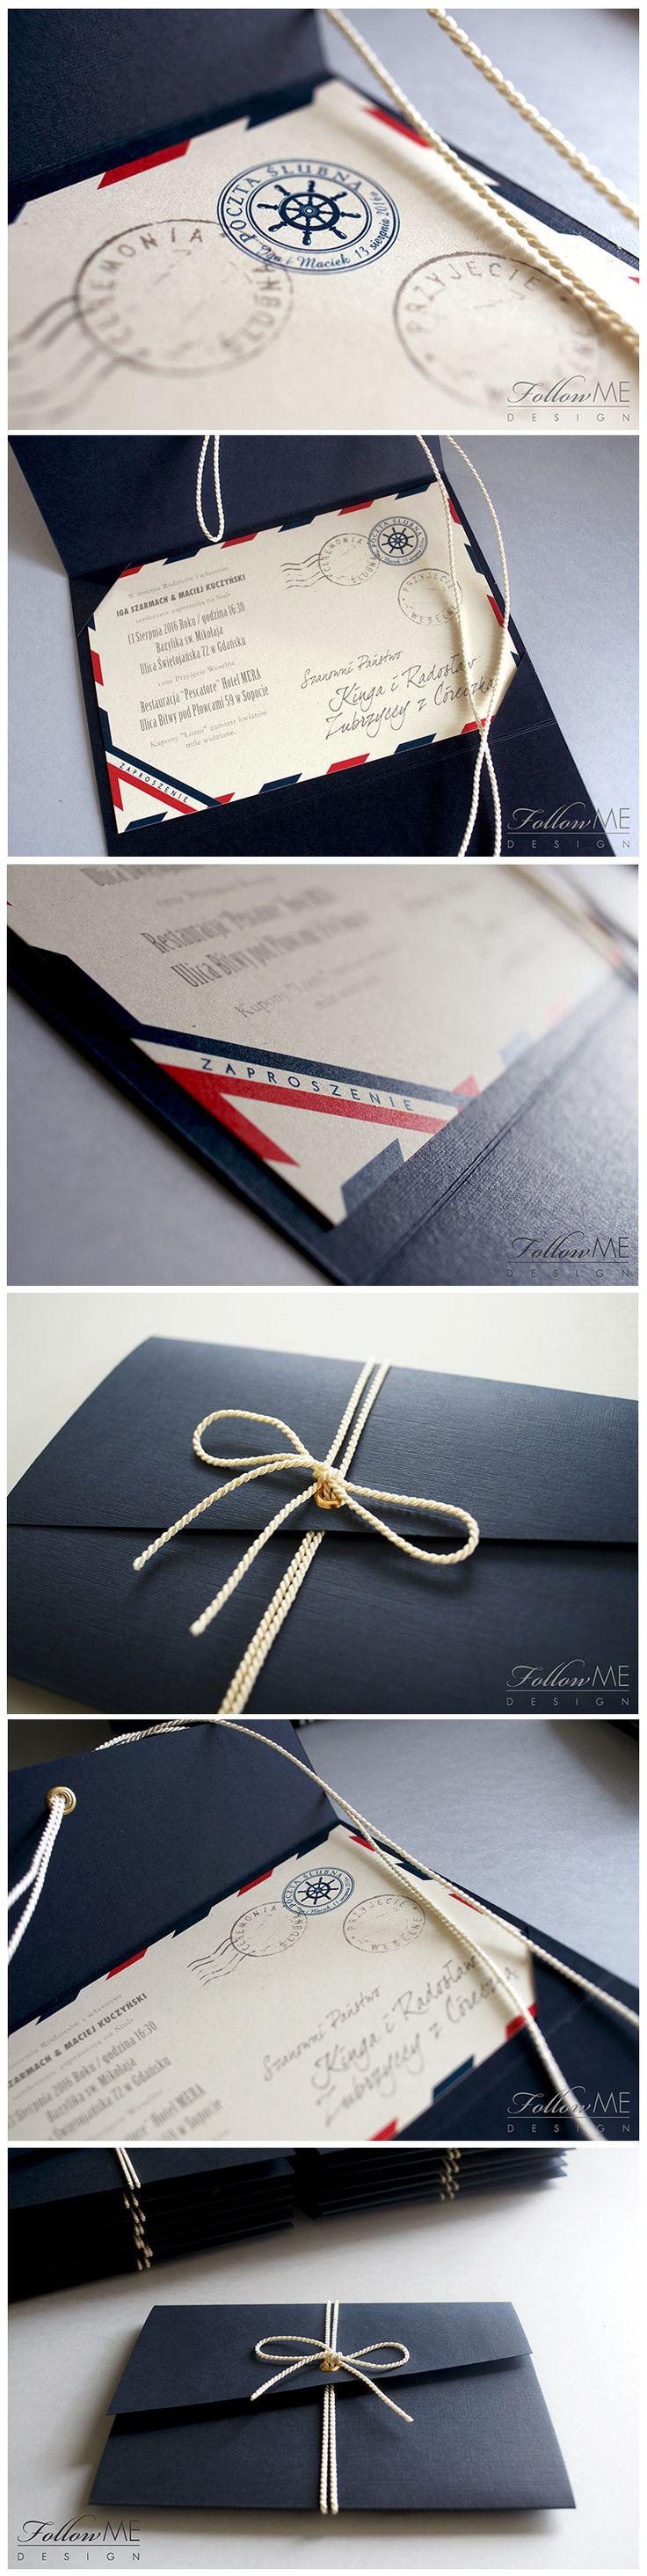 30 Best Invitations Images On Pinterest Weddings Bridal